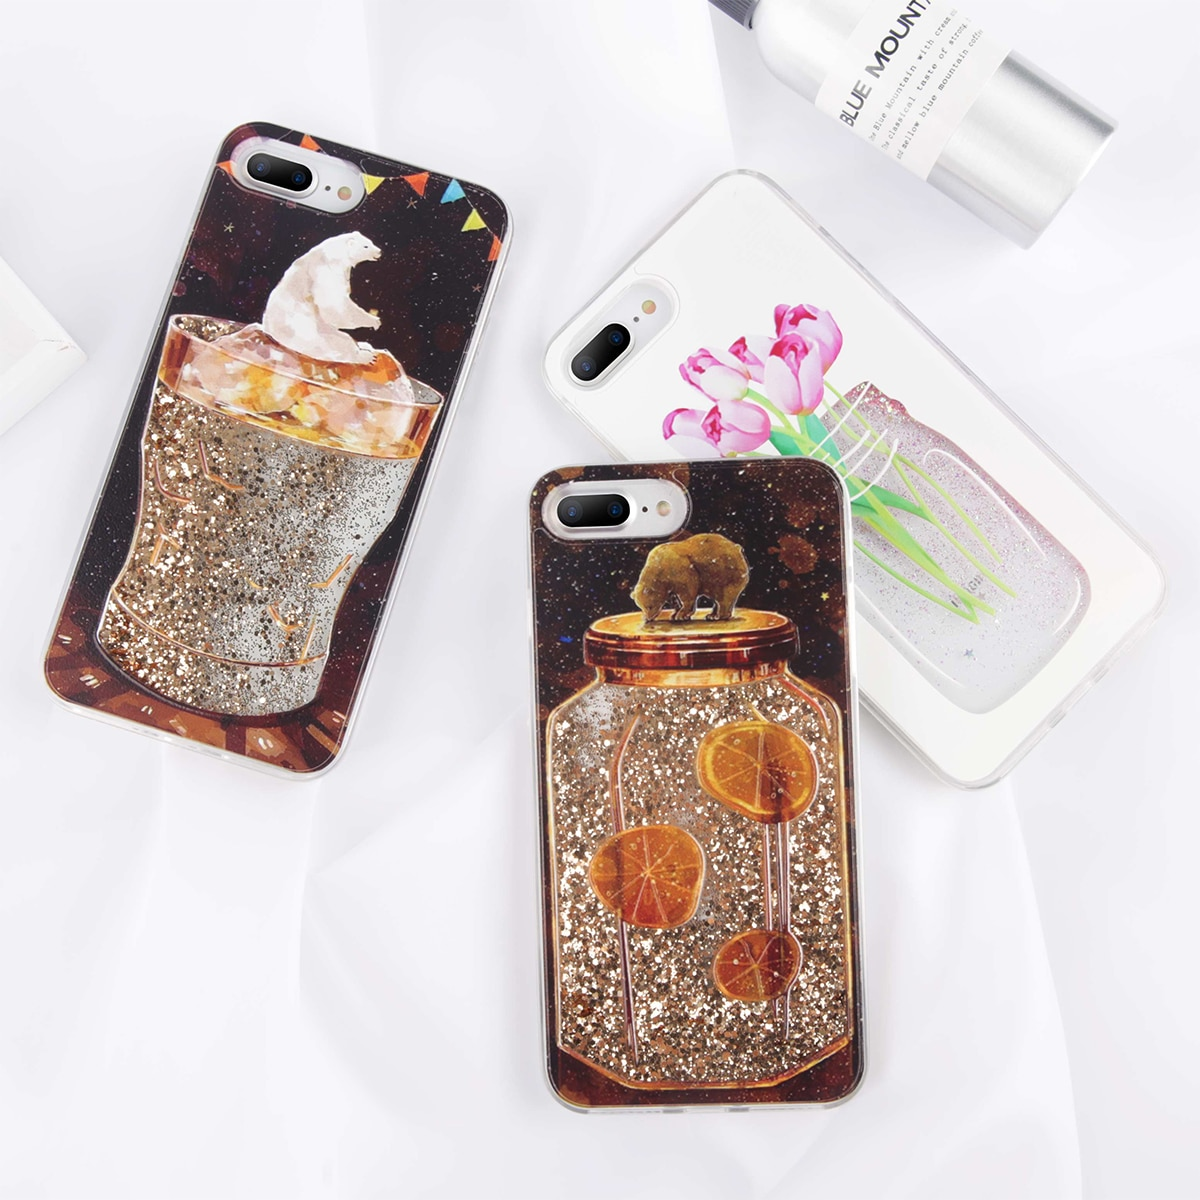 KJOEW Quicksand Animal fruta patrón lindo contraportada de dibujos animados de lujo caso para iPhone 6X6 S 7 8 Plus Funda Capa Coque Shell